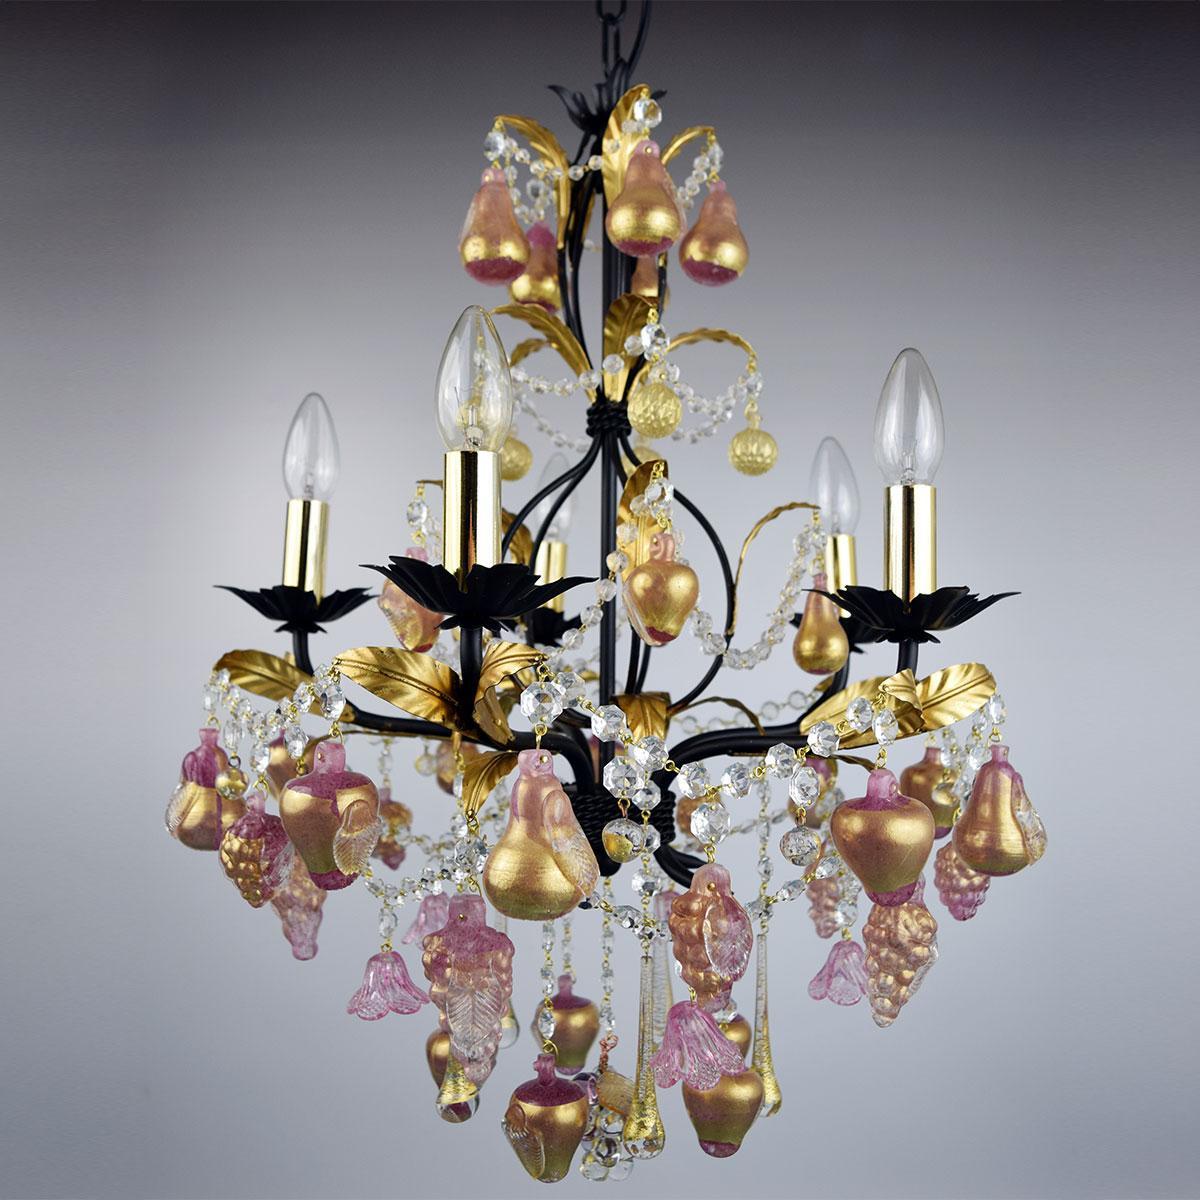 """Grappoli"" Murano glass chandelier - 5 lights - gold"